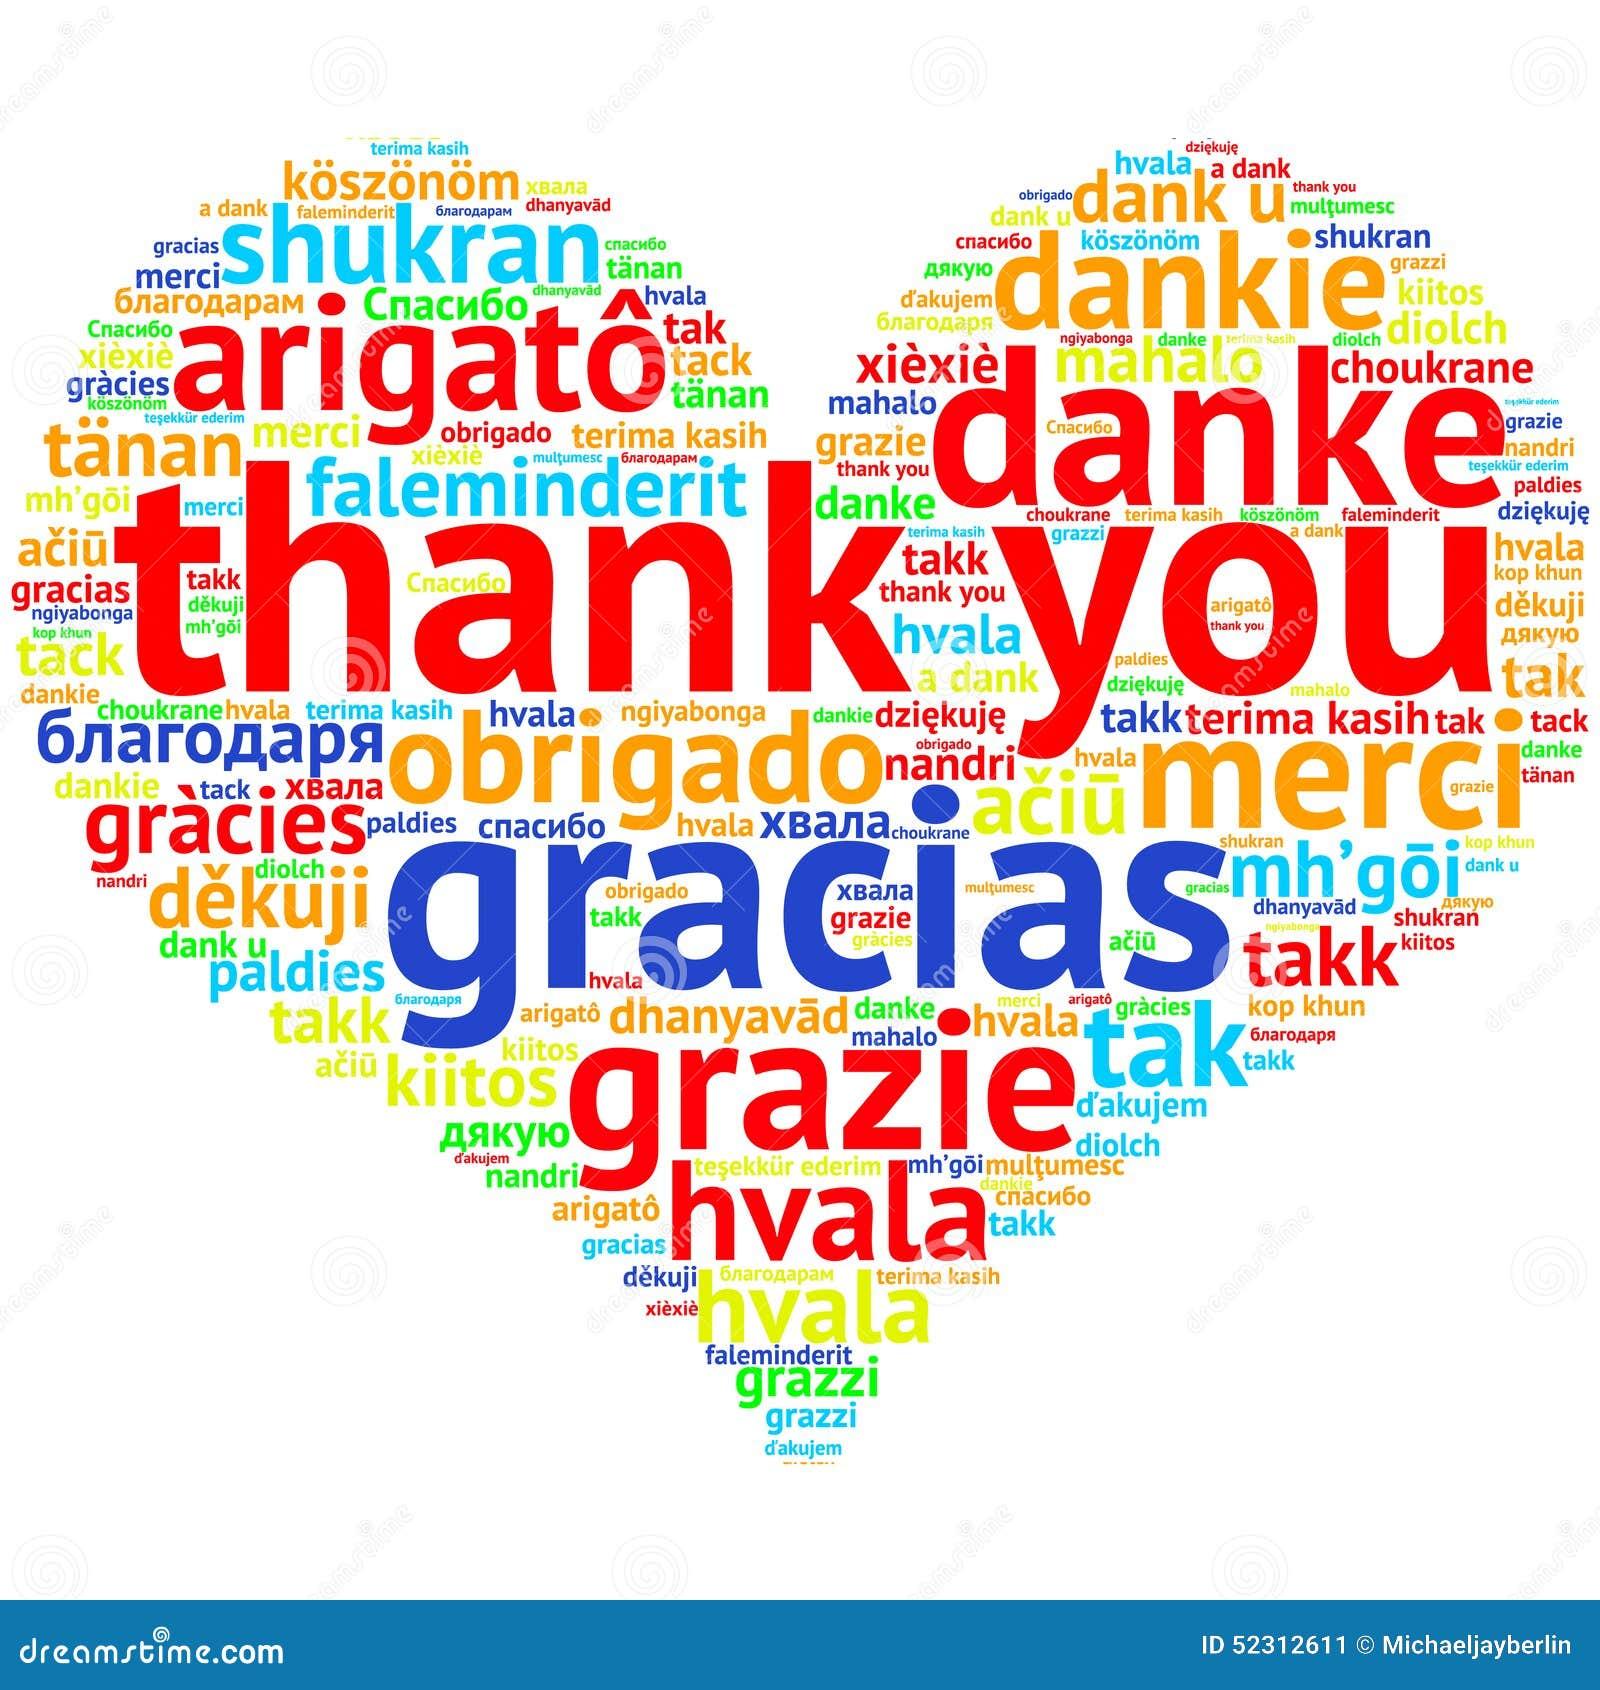 vielen dank in english